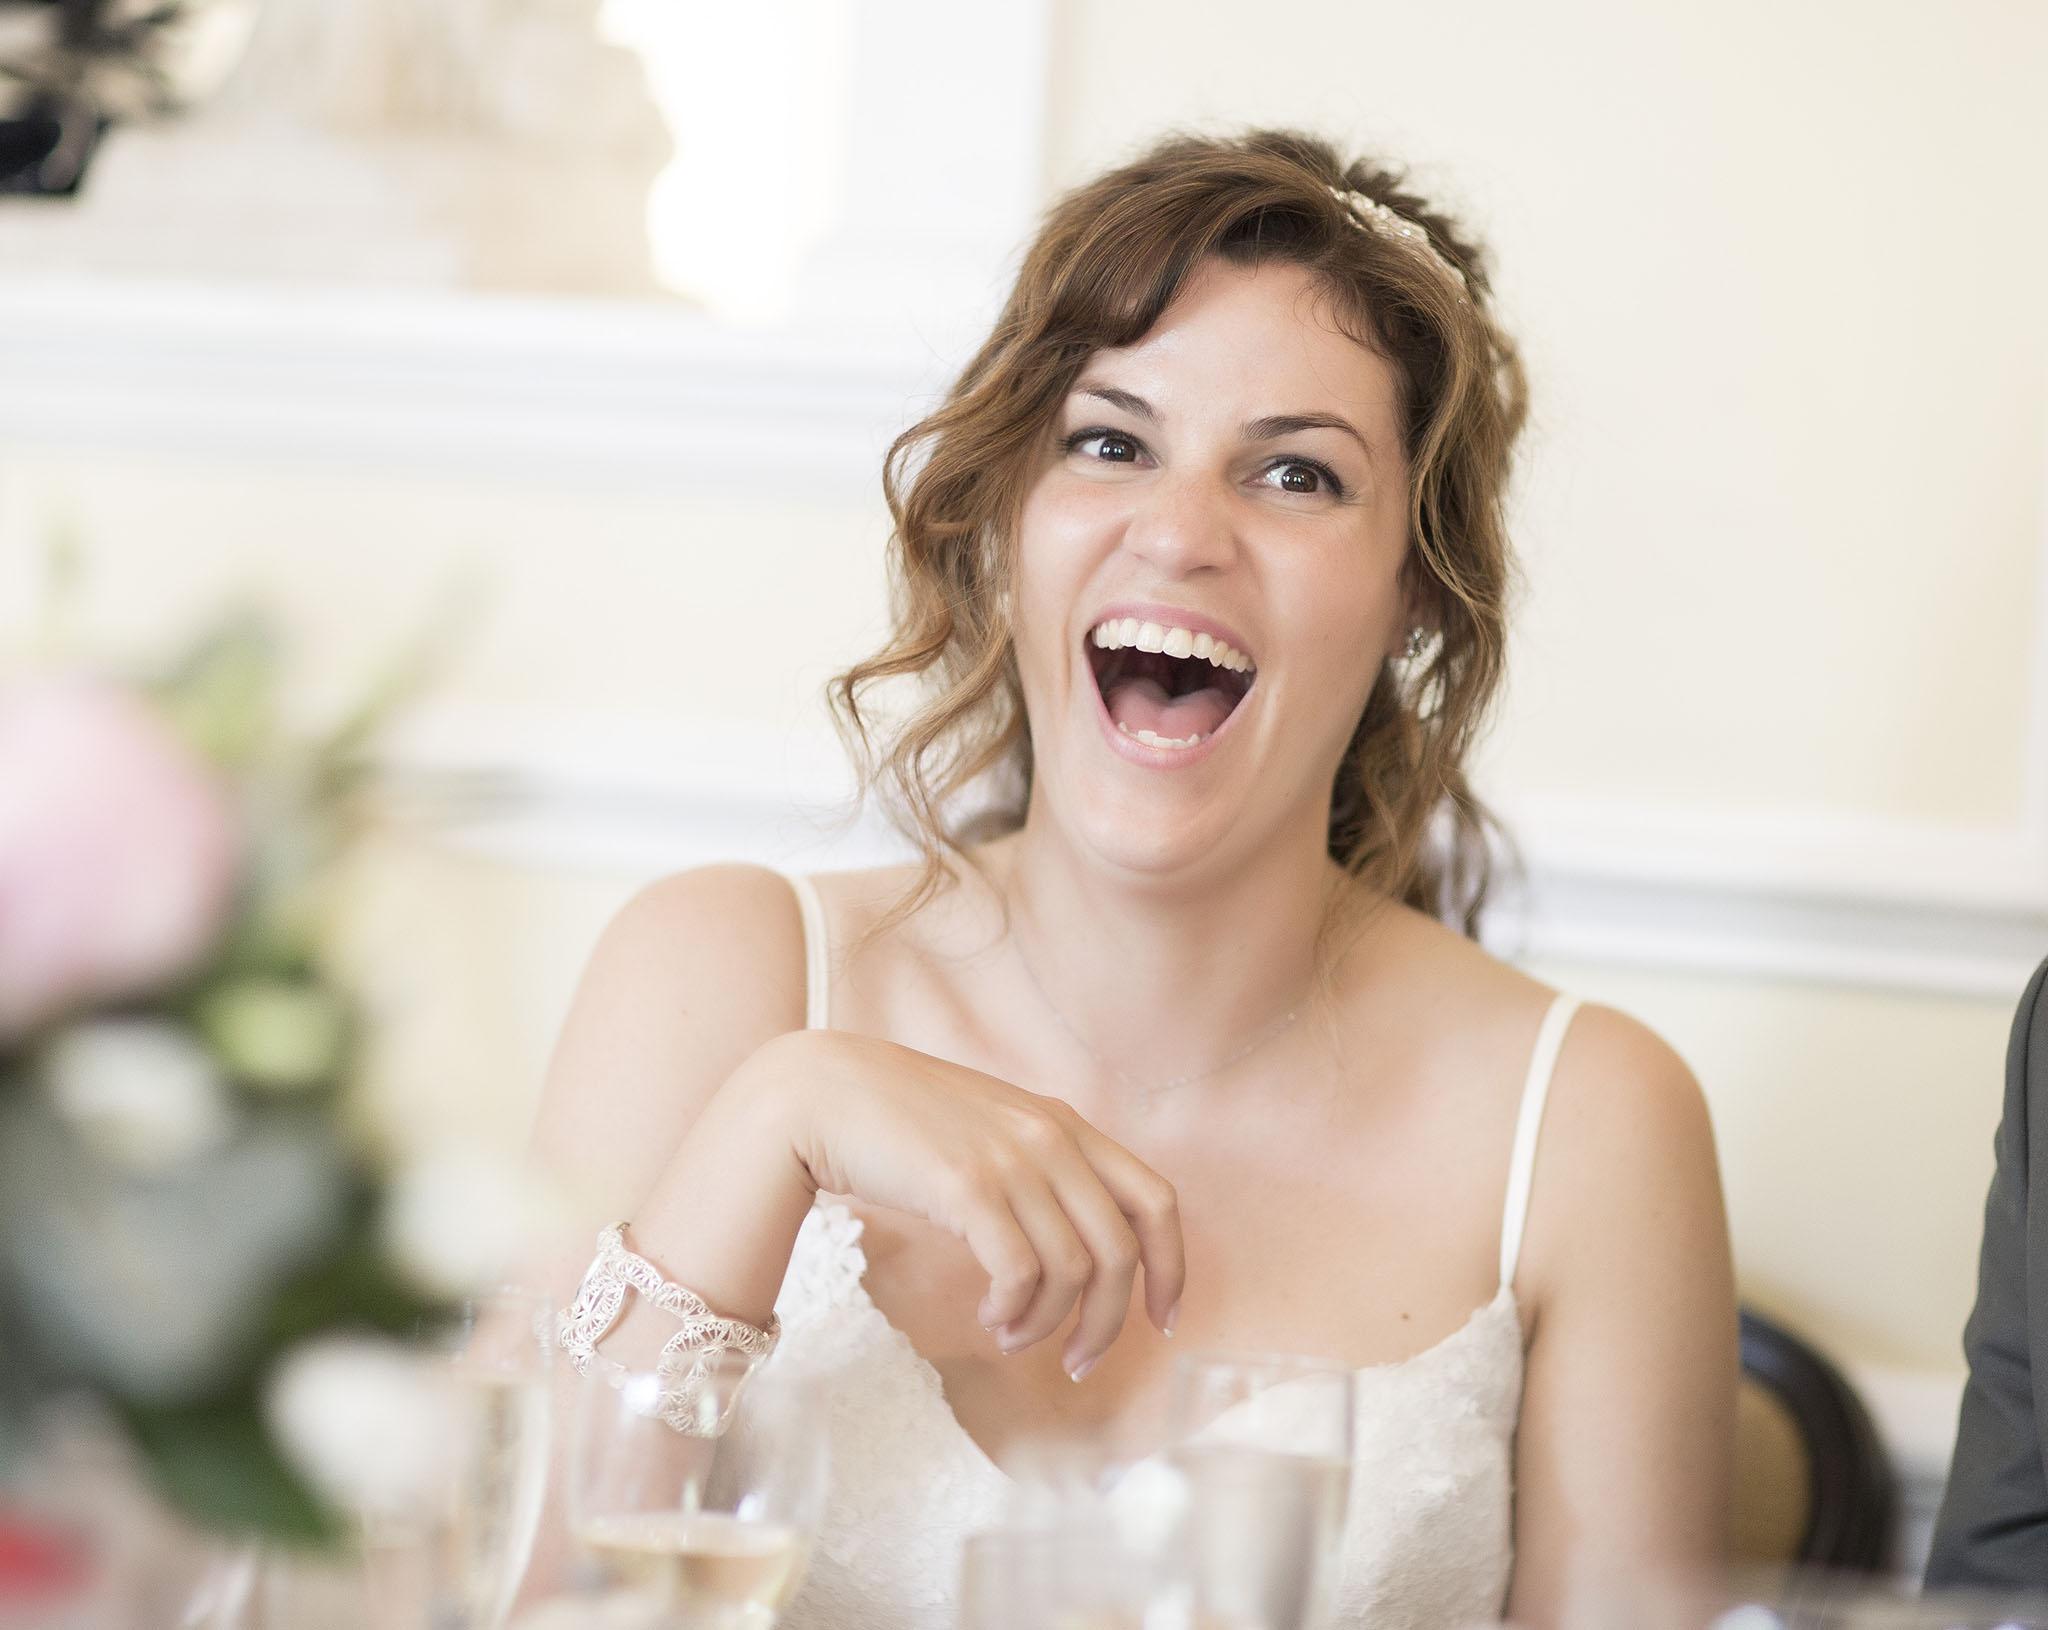 elizabethgphotography_kingslangley_hertfordshire_fineart_wedding_enfield_ricky_nicole_nahlis_43.jpg